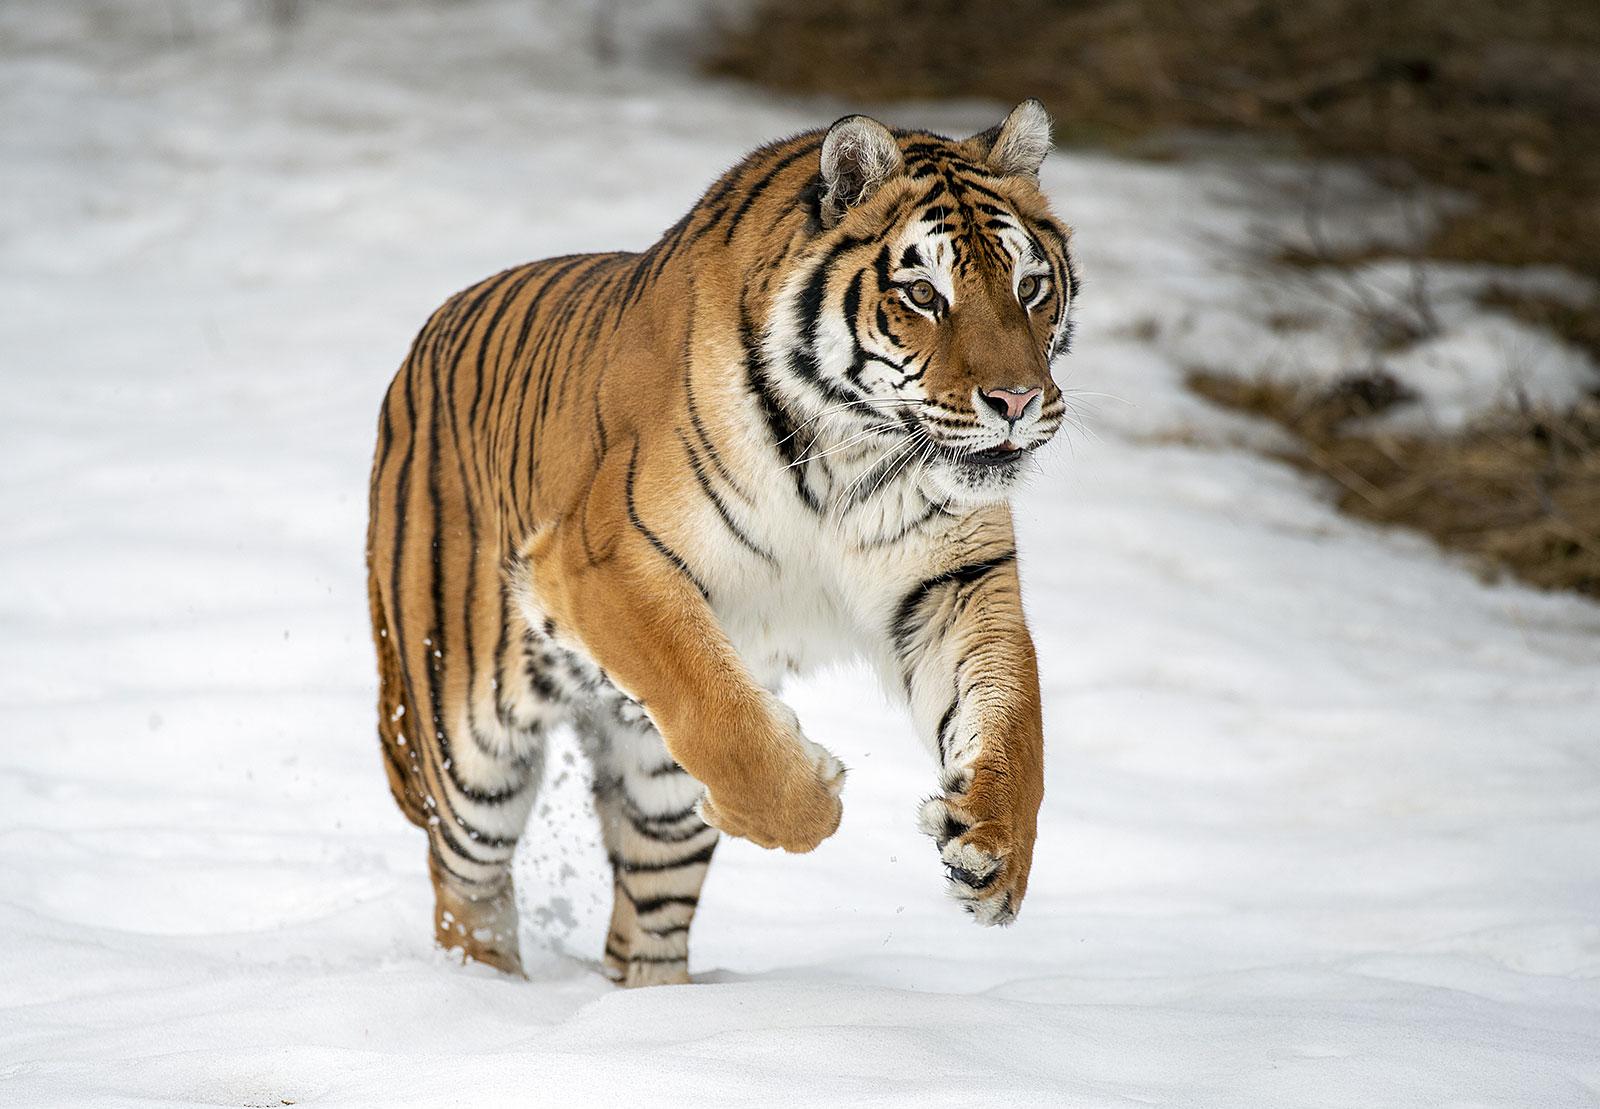 tiger Siberian image